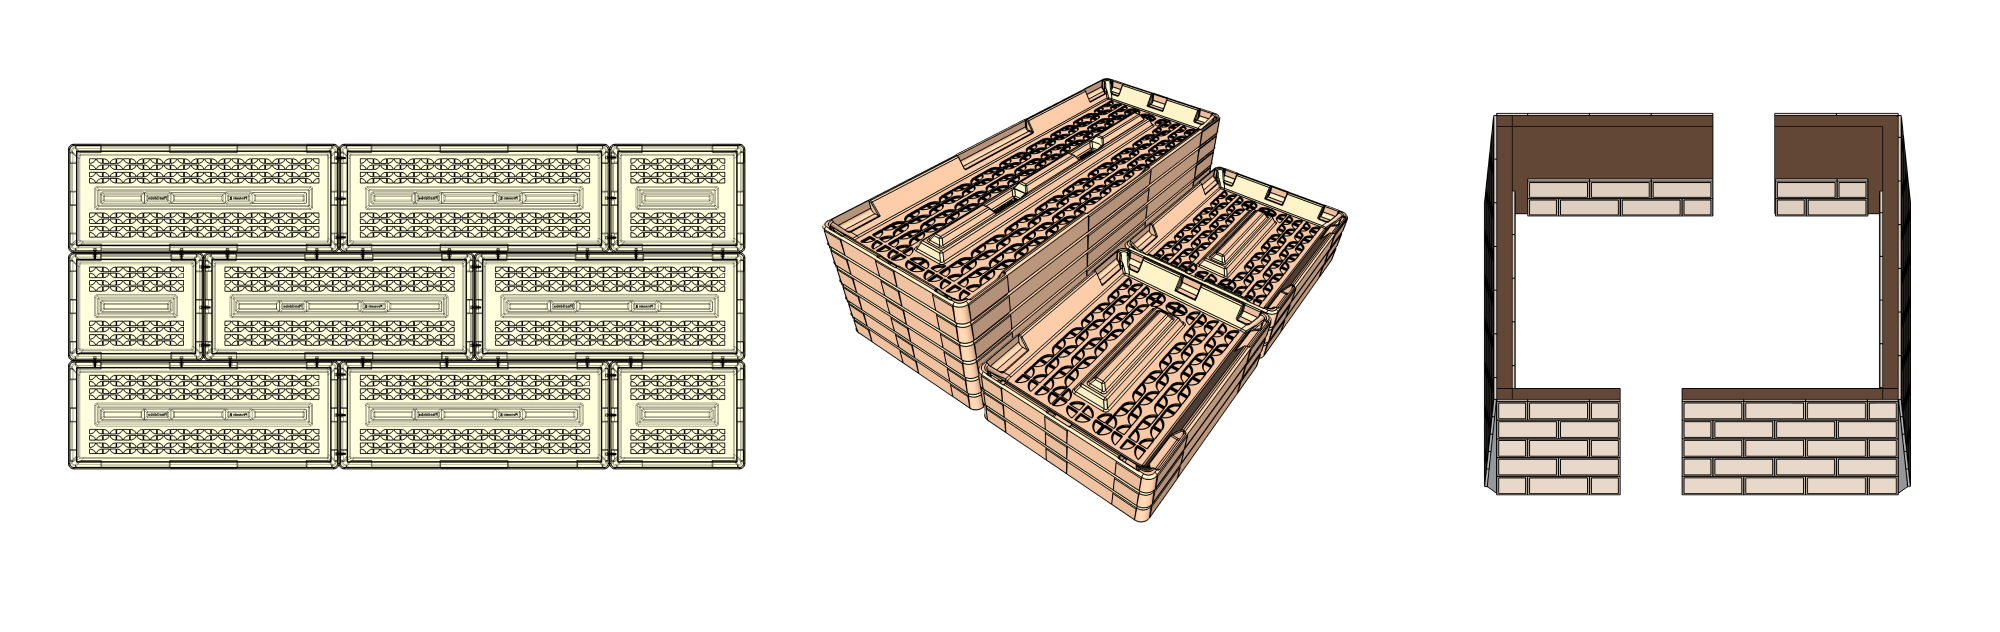 Concept design of Plastidobe blocks in Shapr3D